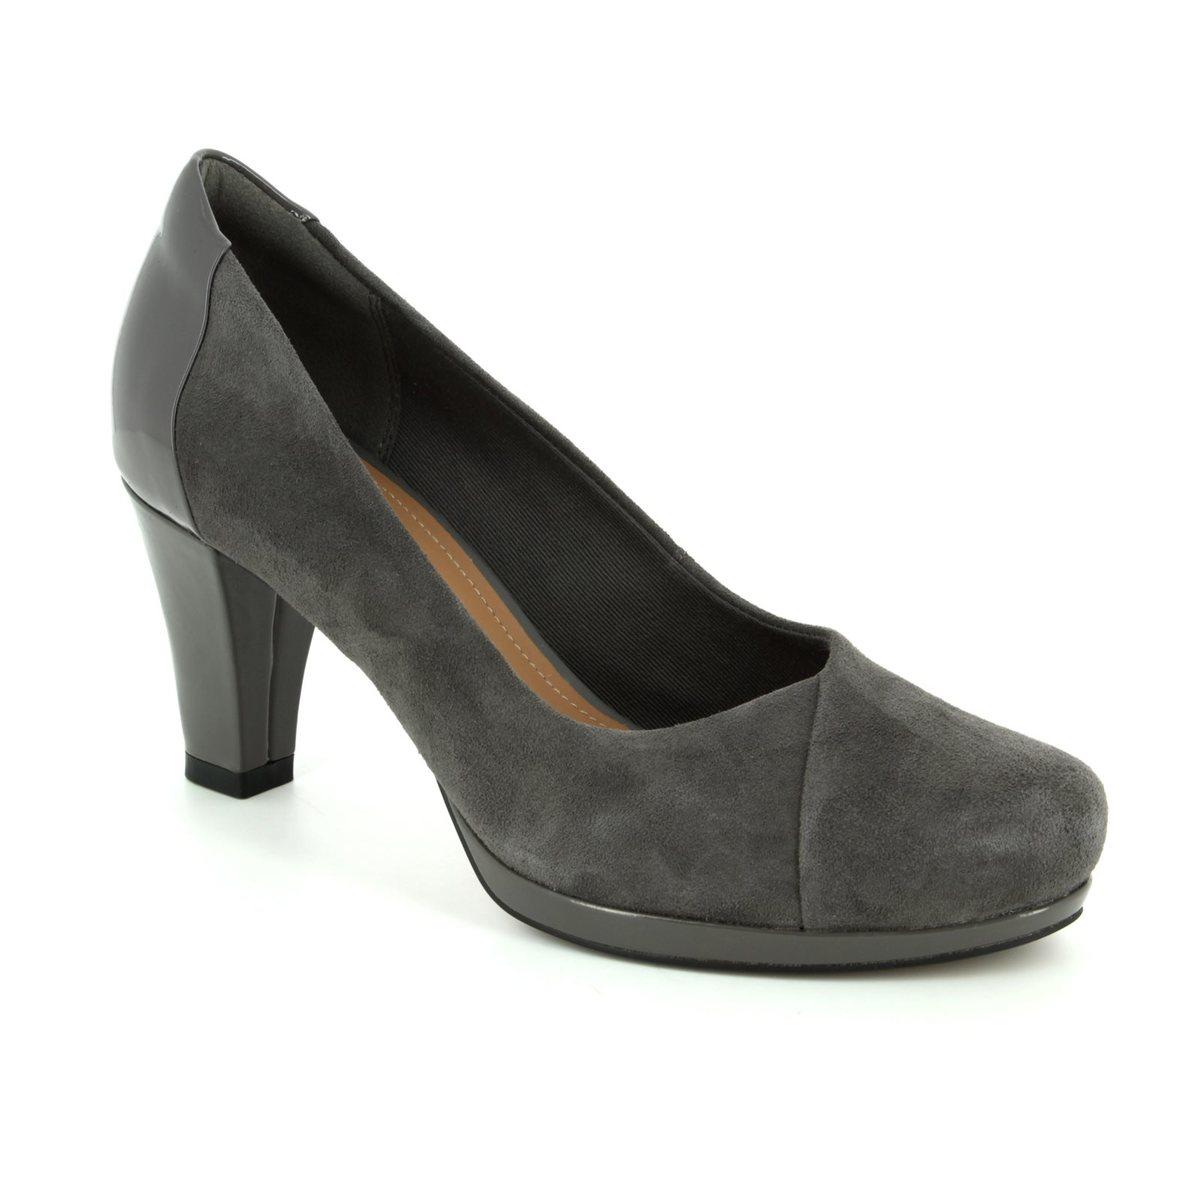 53b25892f Clarks High-heeled Shoes - Dark Grey - 2882 04D CHORUS CAROL